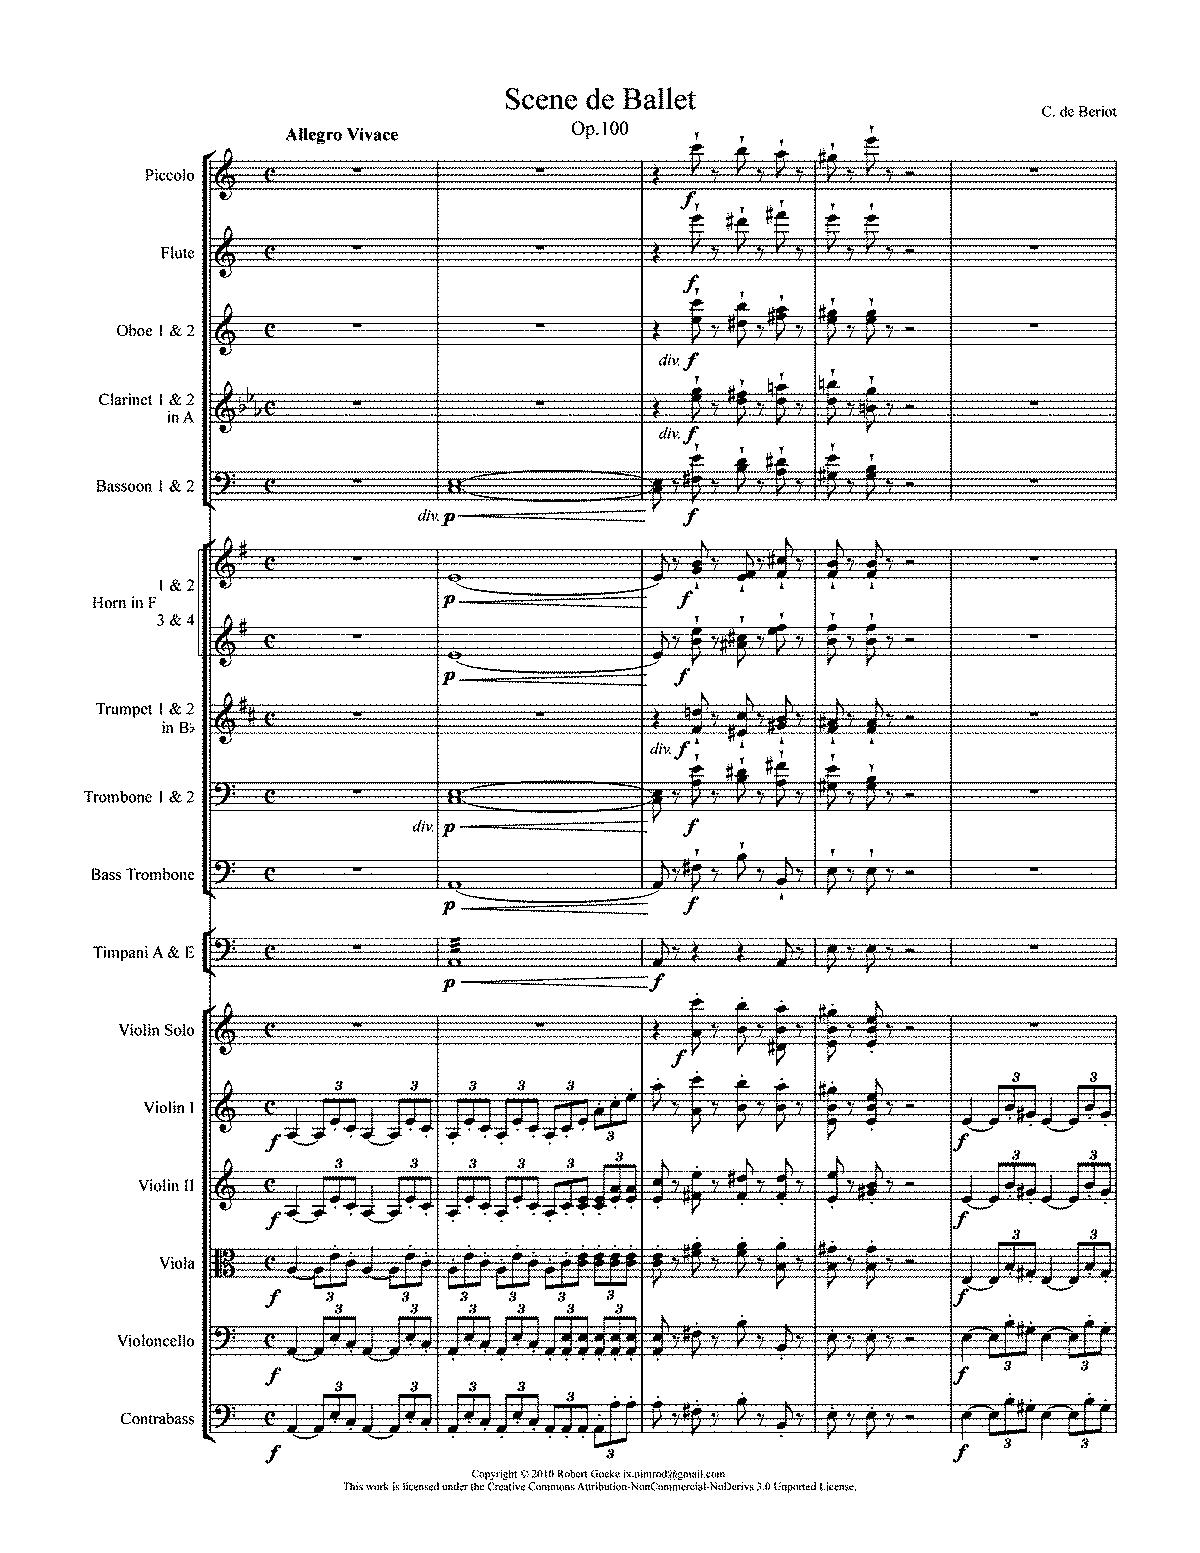 Bériot, op. 100